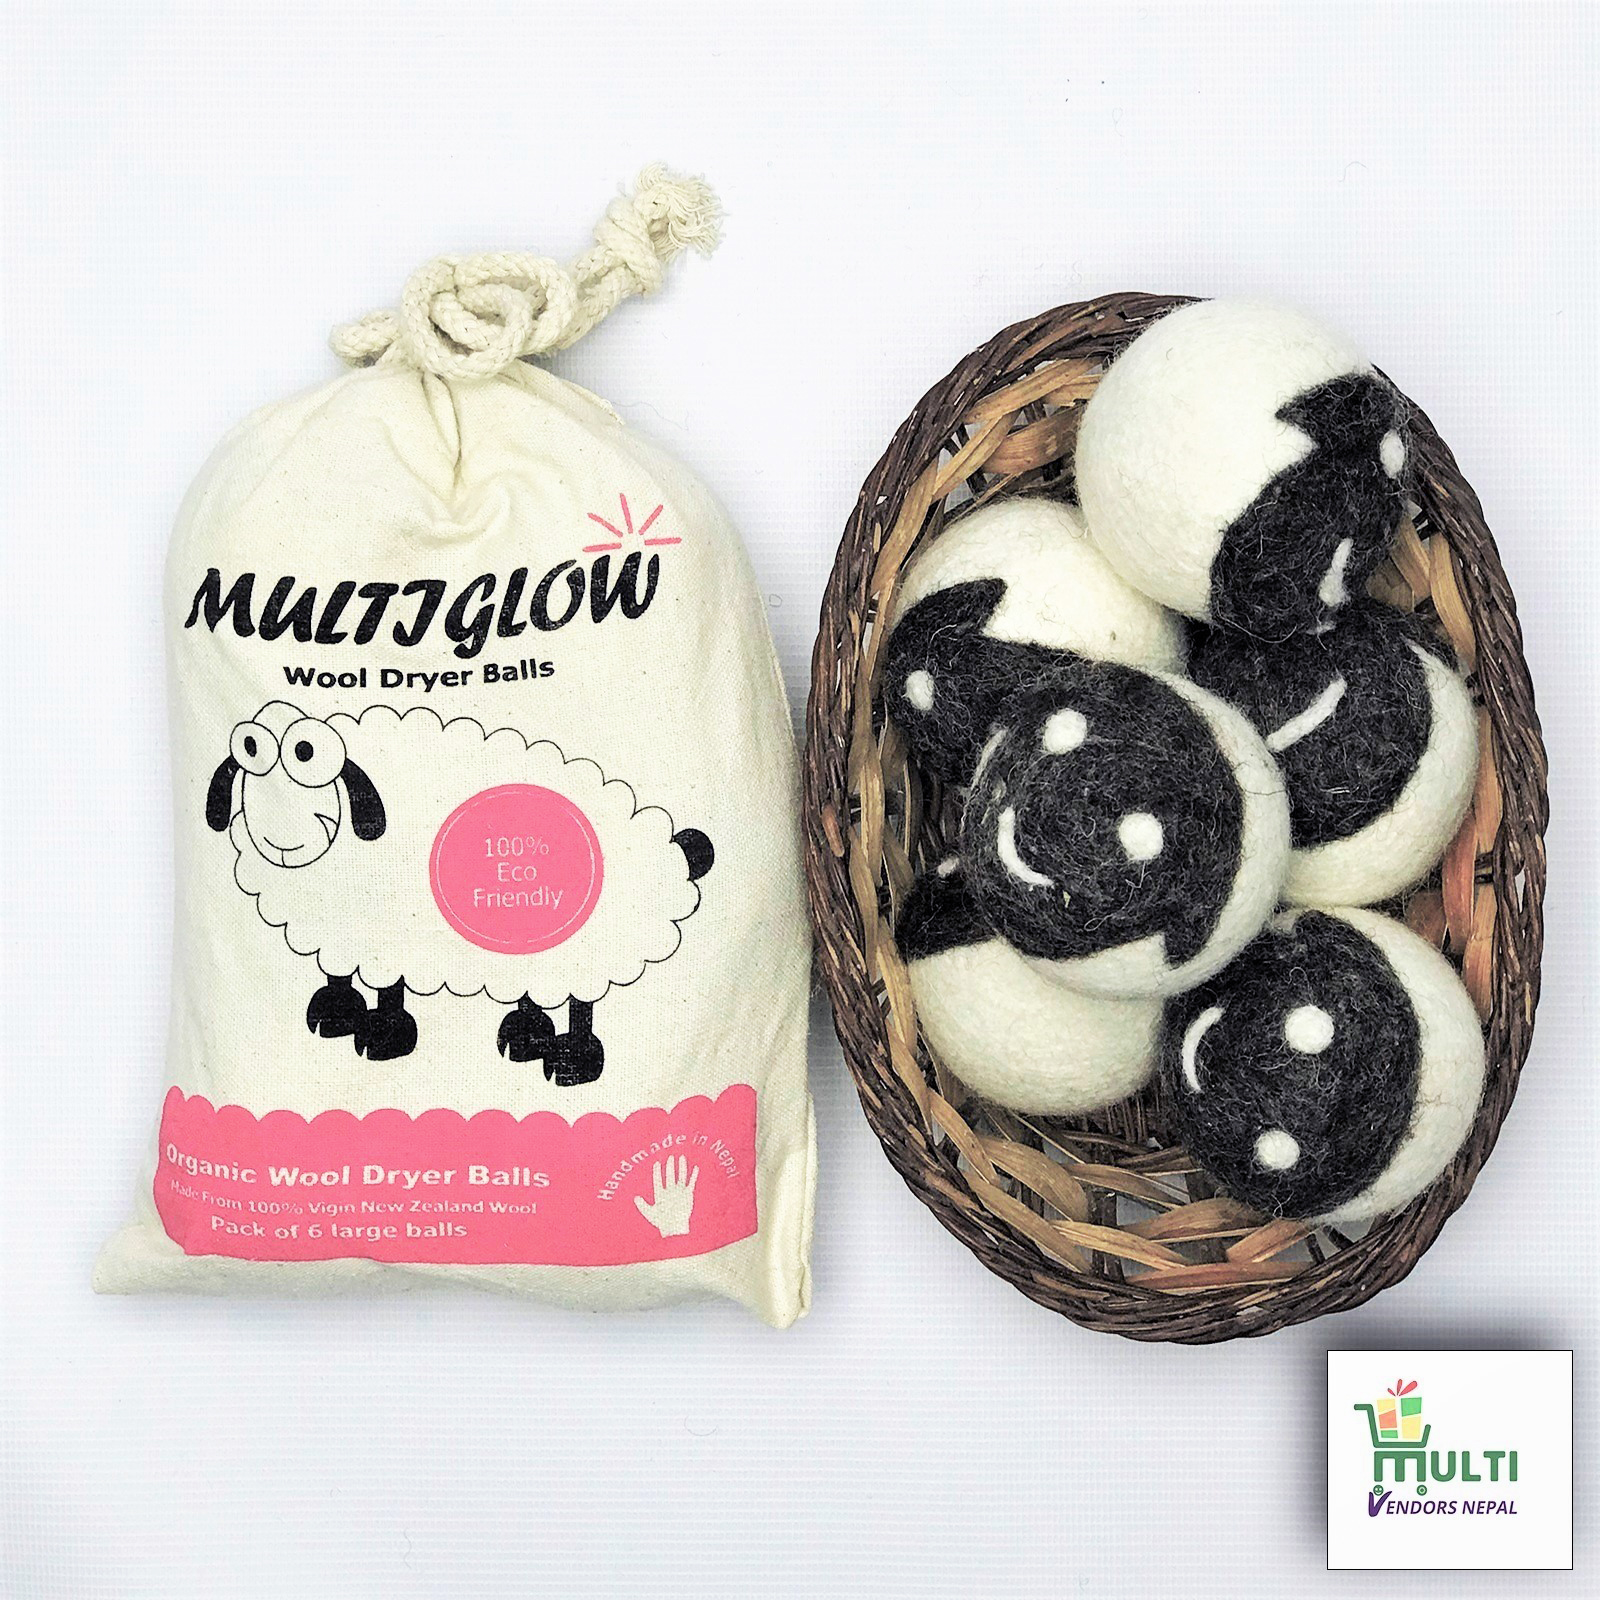 Multiglow Wool Dryer Balls- 1 Pack